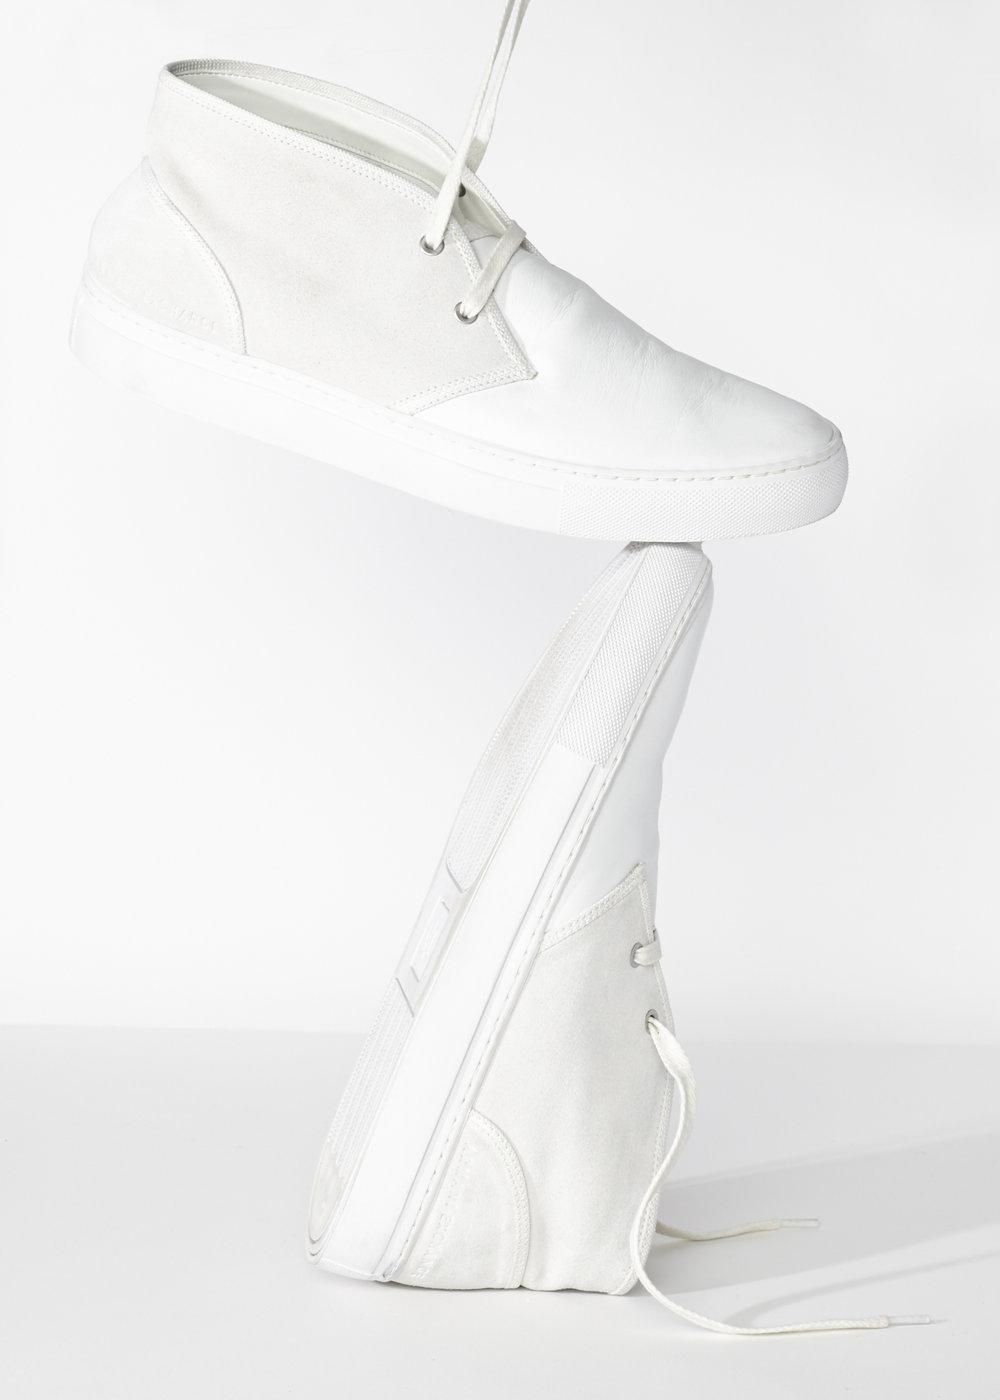 shoebalance.jpg